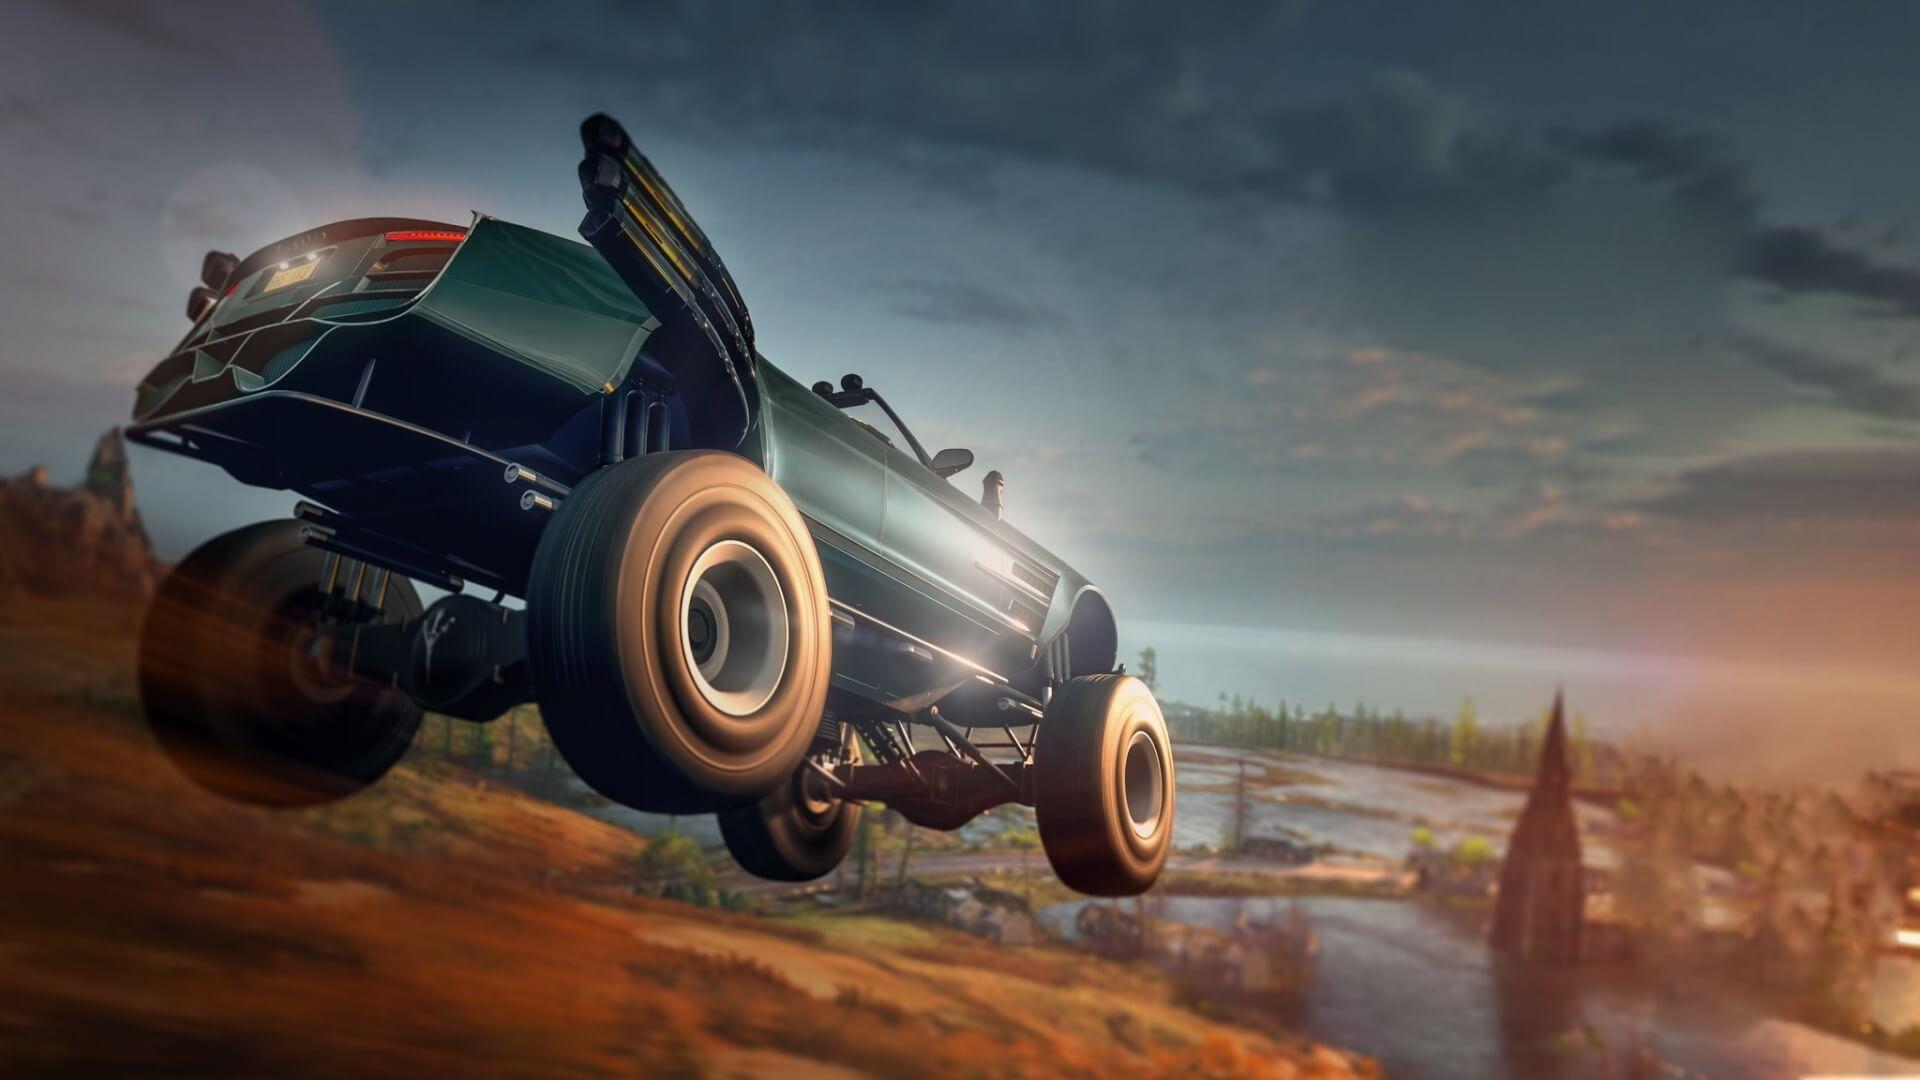 Forza Horizon 4 Series 6 Update Arrives This Week